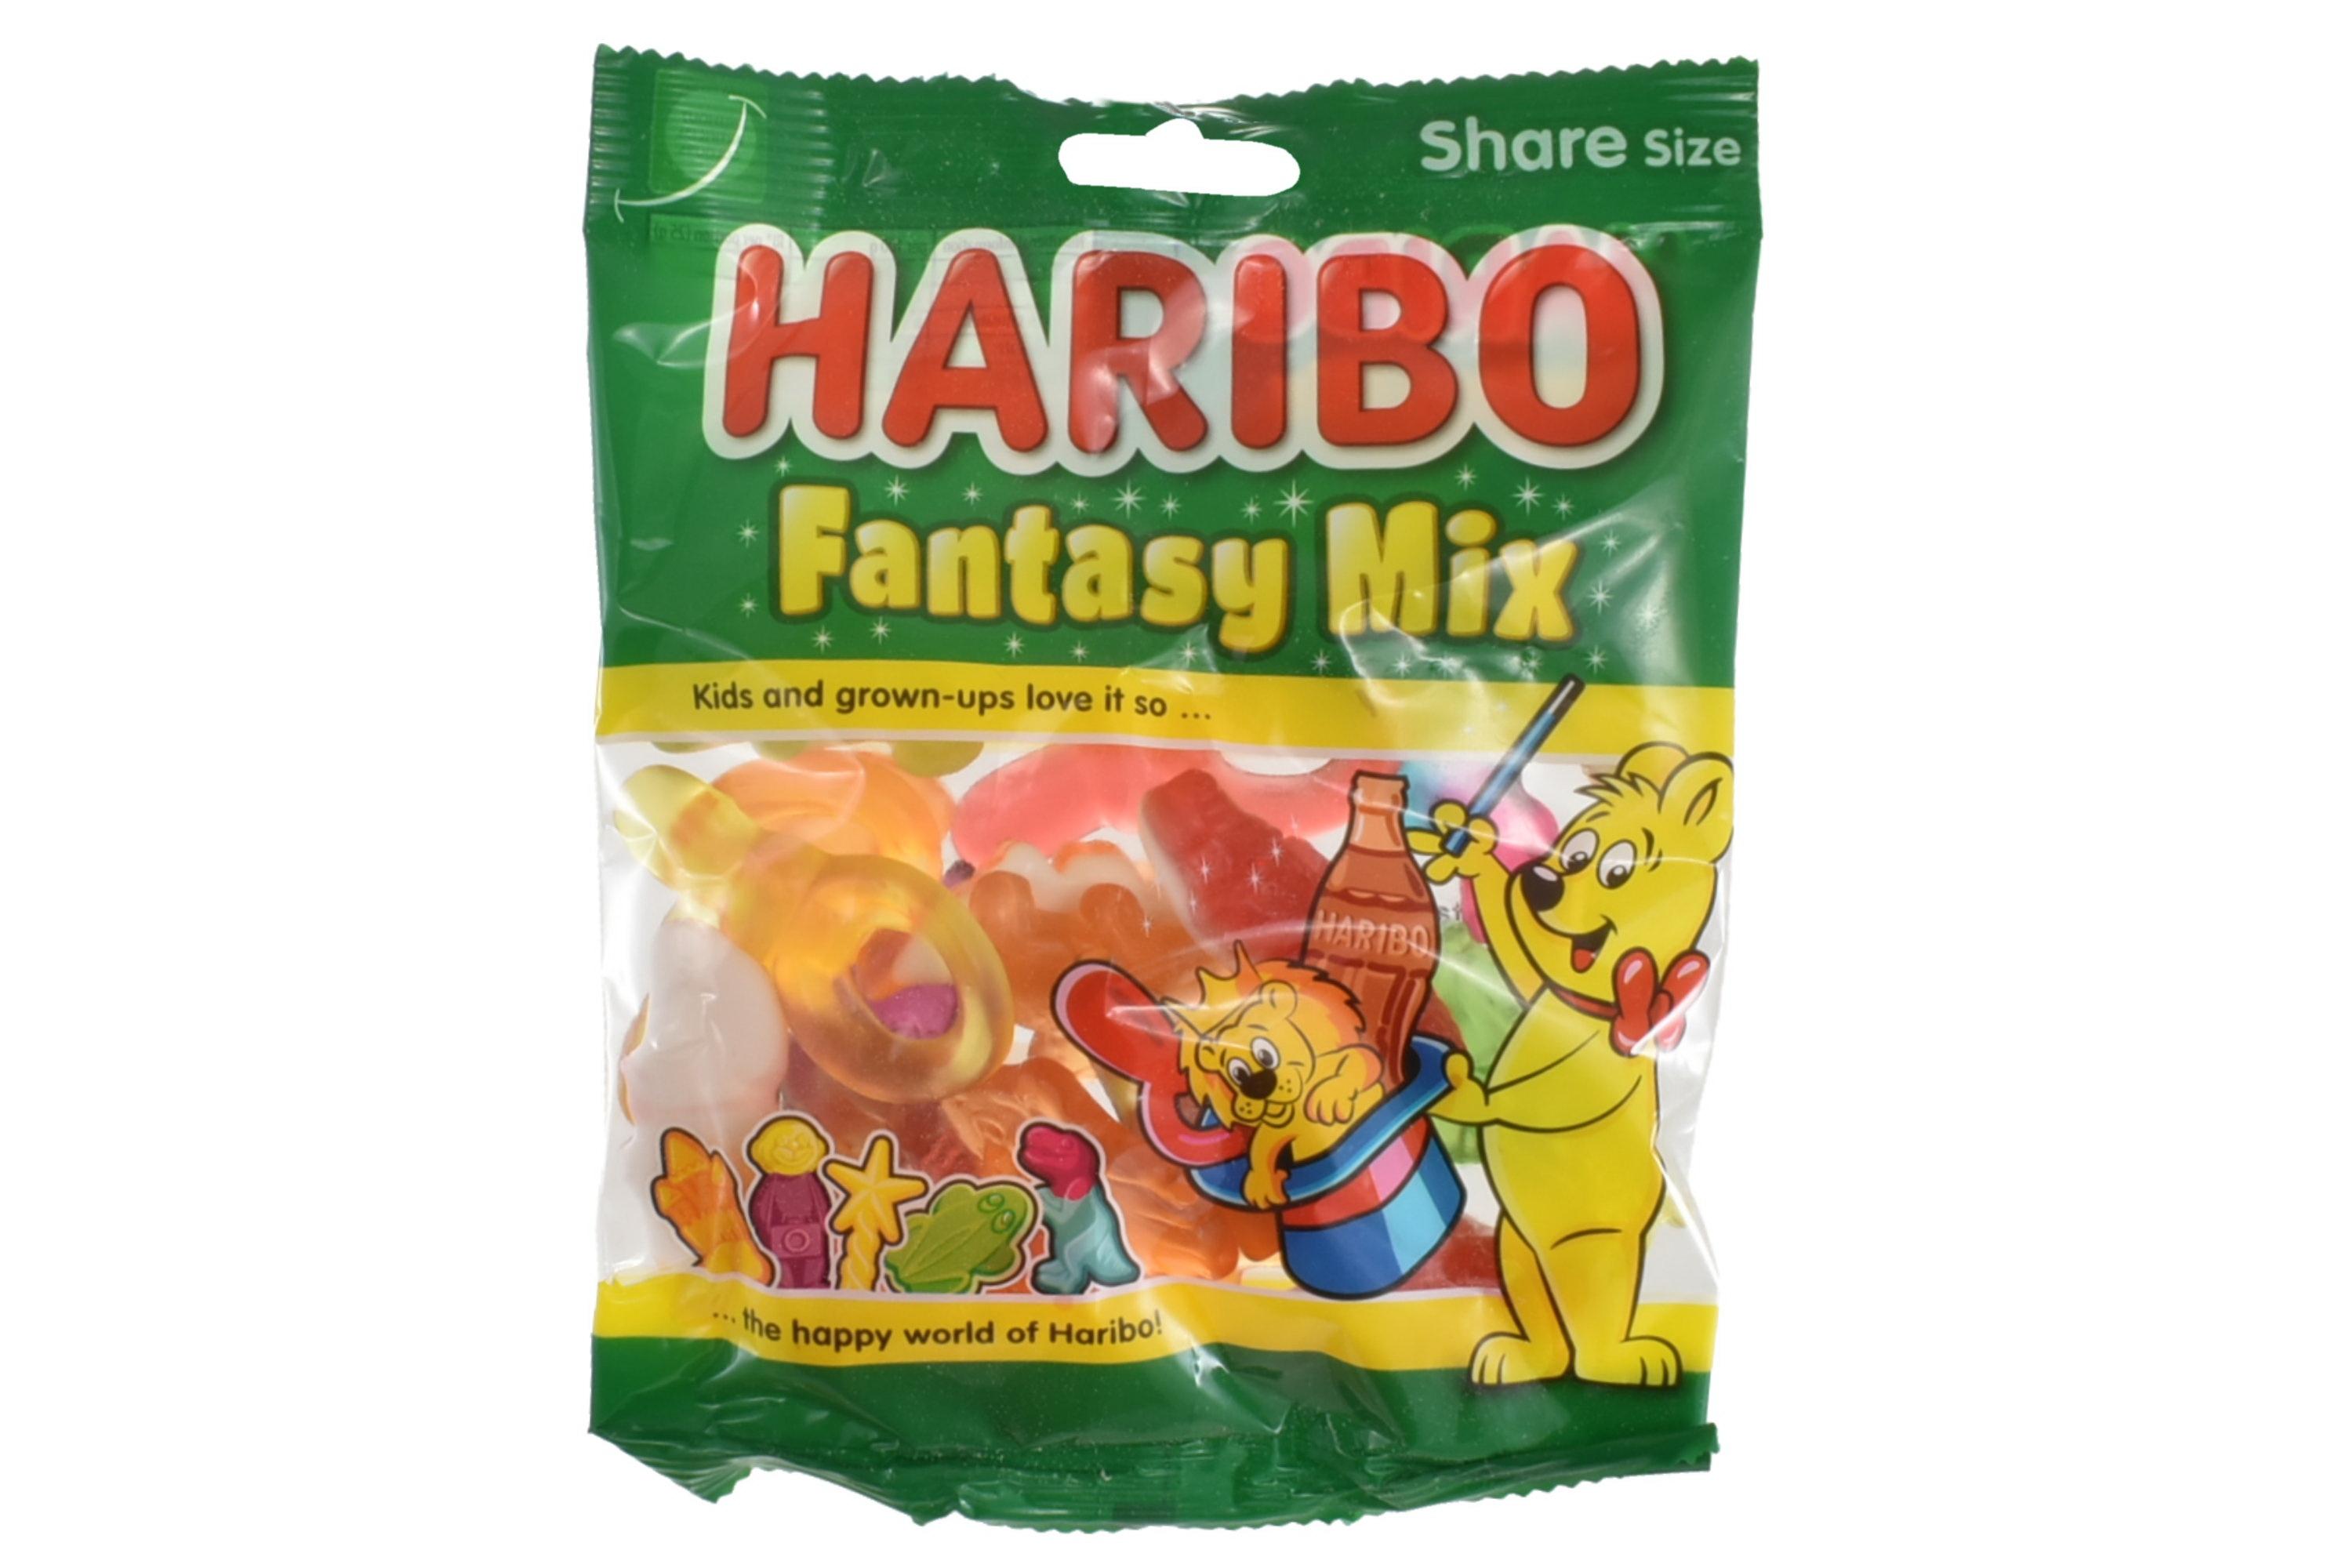 140g Fantasy Mix Prepack - Haribo